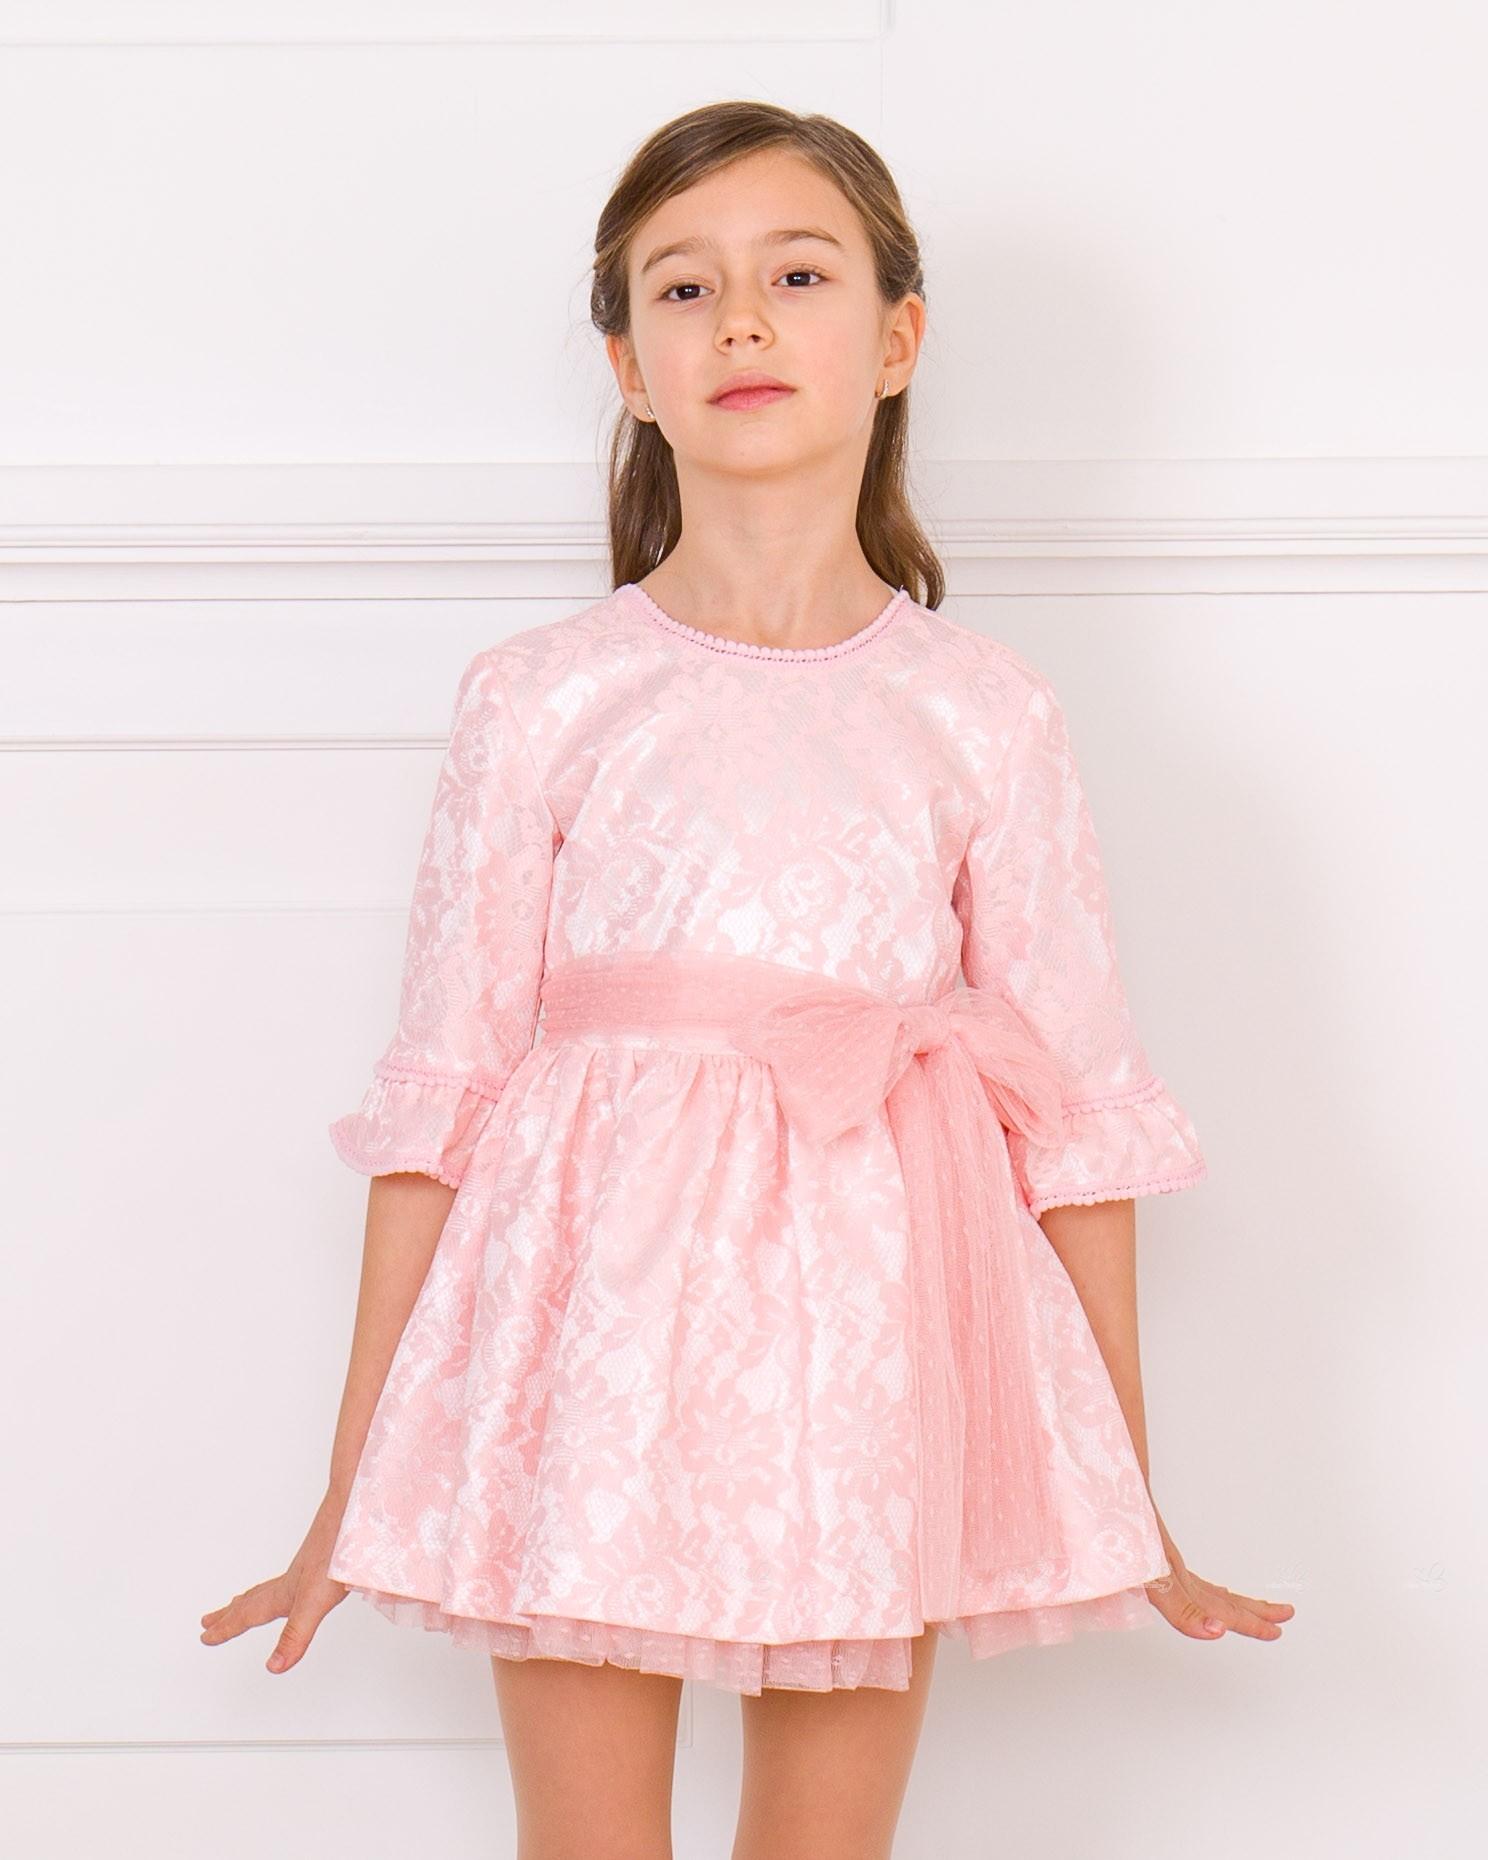 a499f9d90 ... Nekenia Vestido Niña Manga Francesa Raso   Encaje Rosa ...